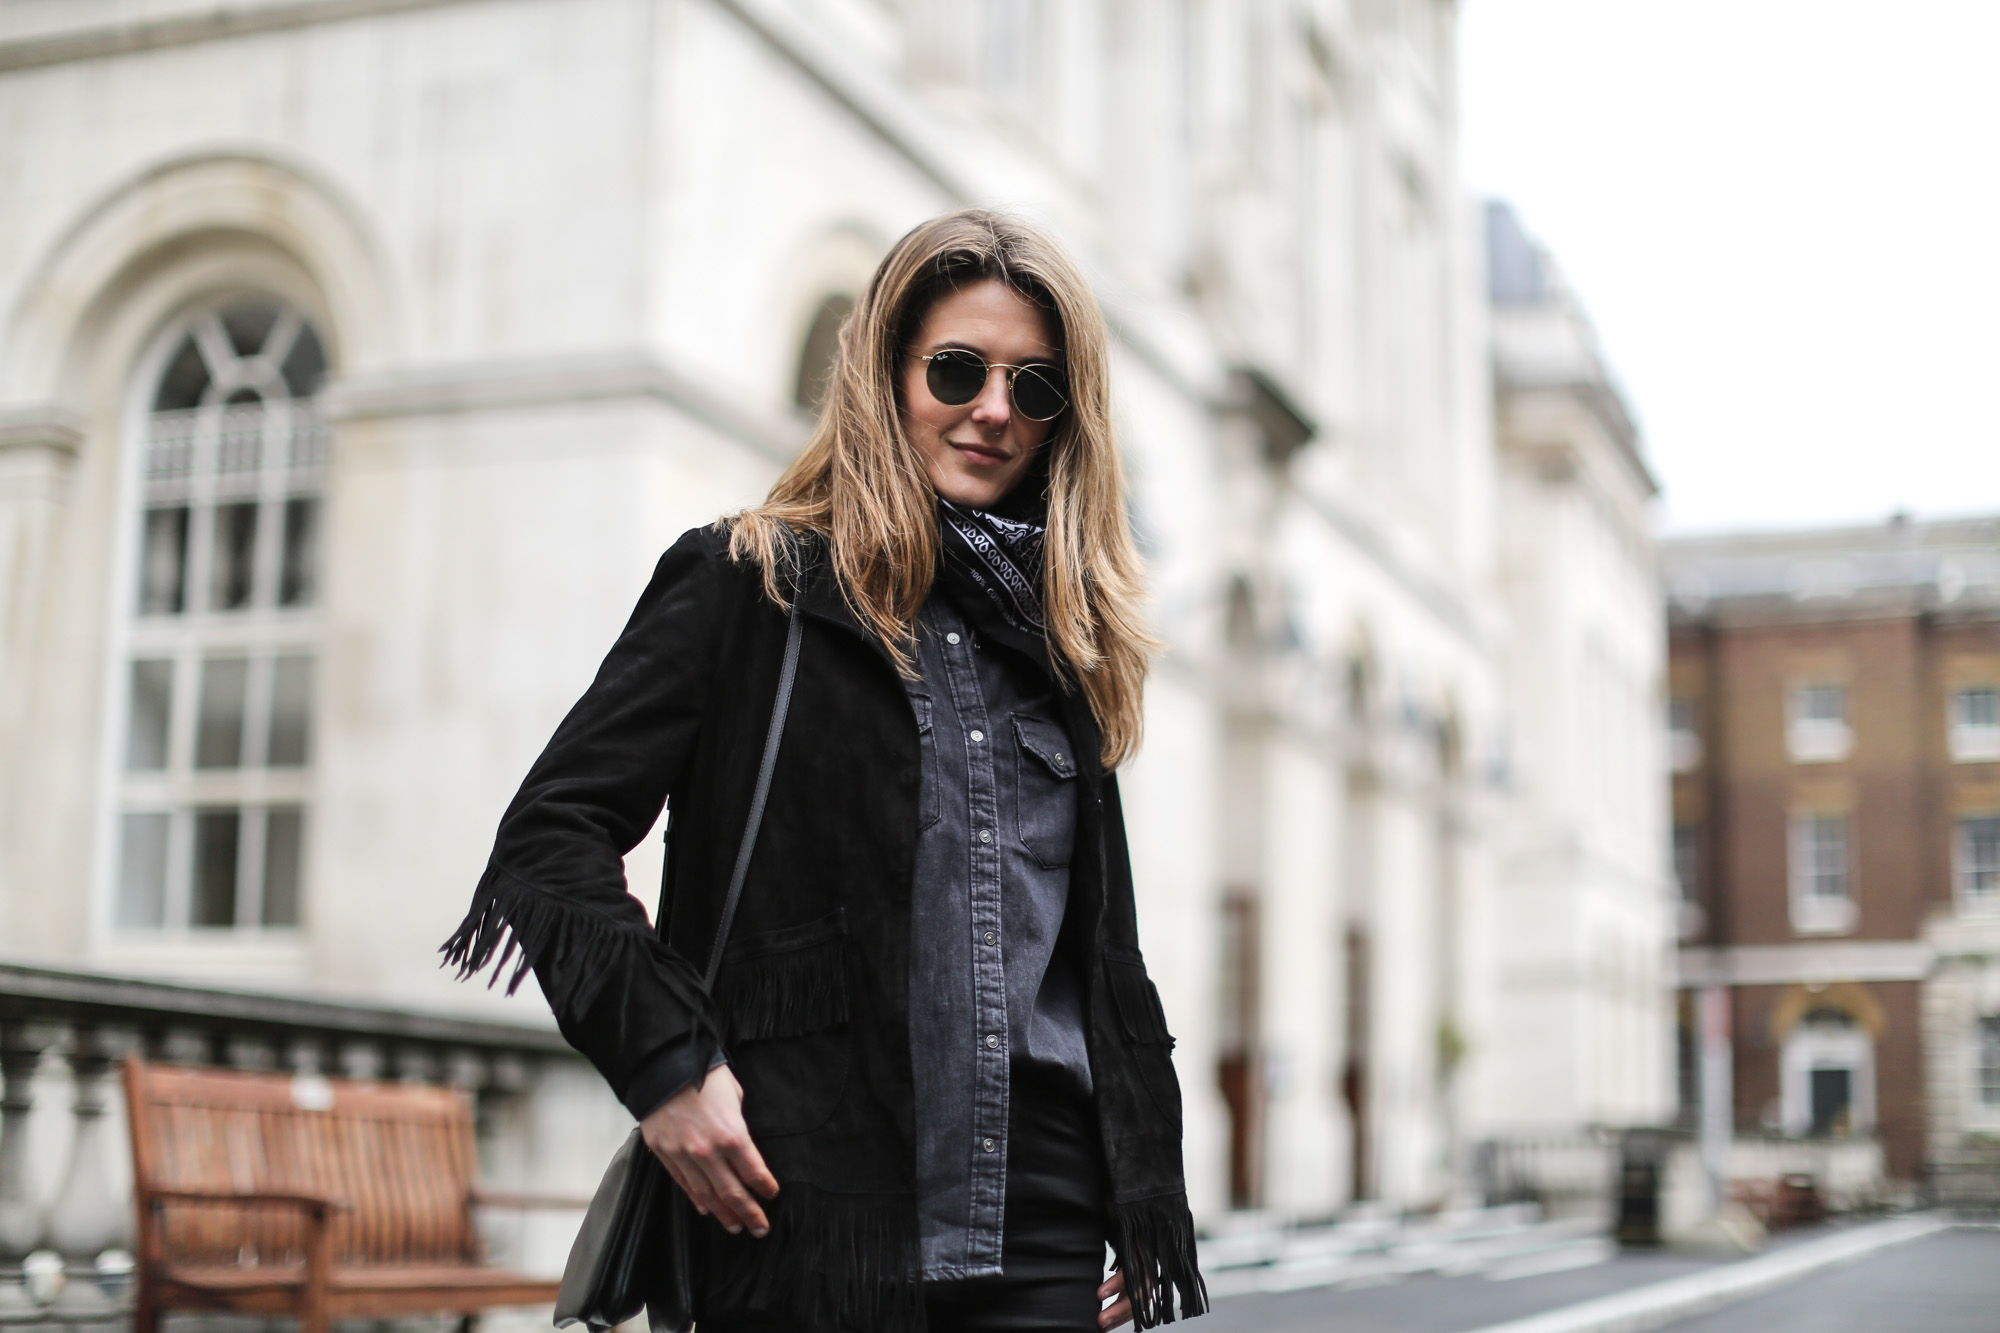 Clochet-streetstyle-lfw-london-fashion-week-maje-fringed-suede-jacket-cowboy-boots-2